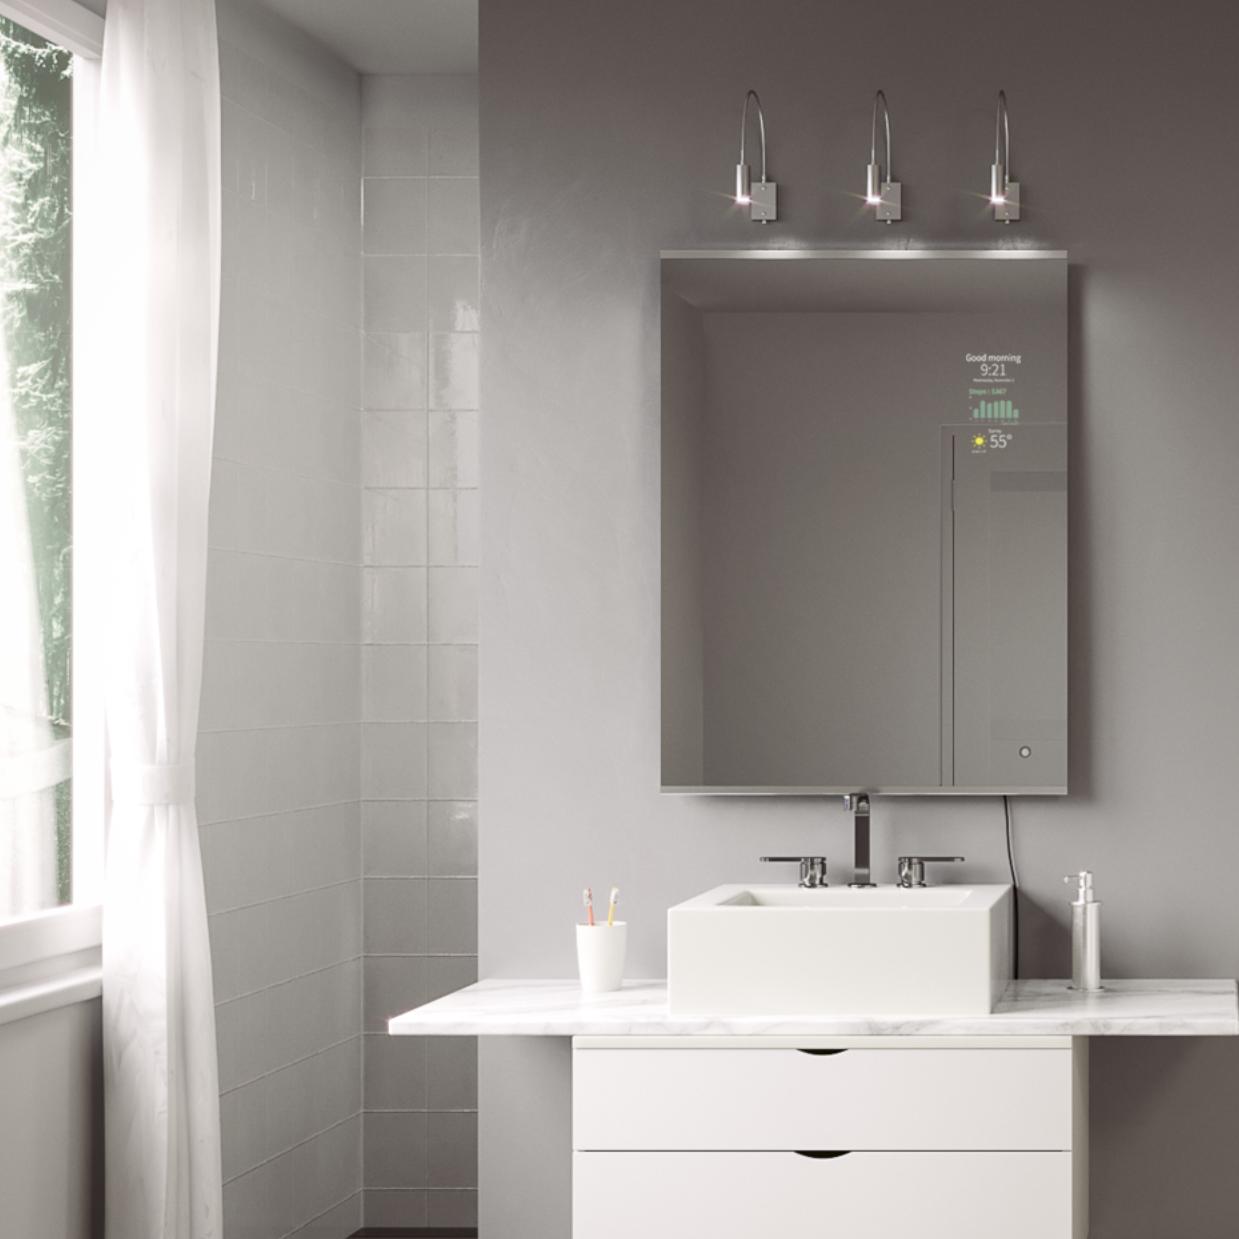 Mango Smart Mirror | Display